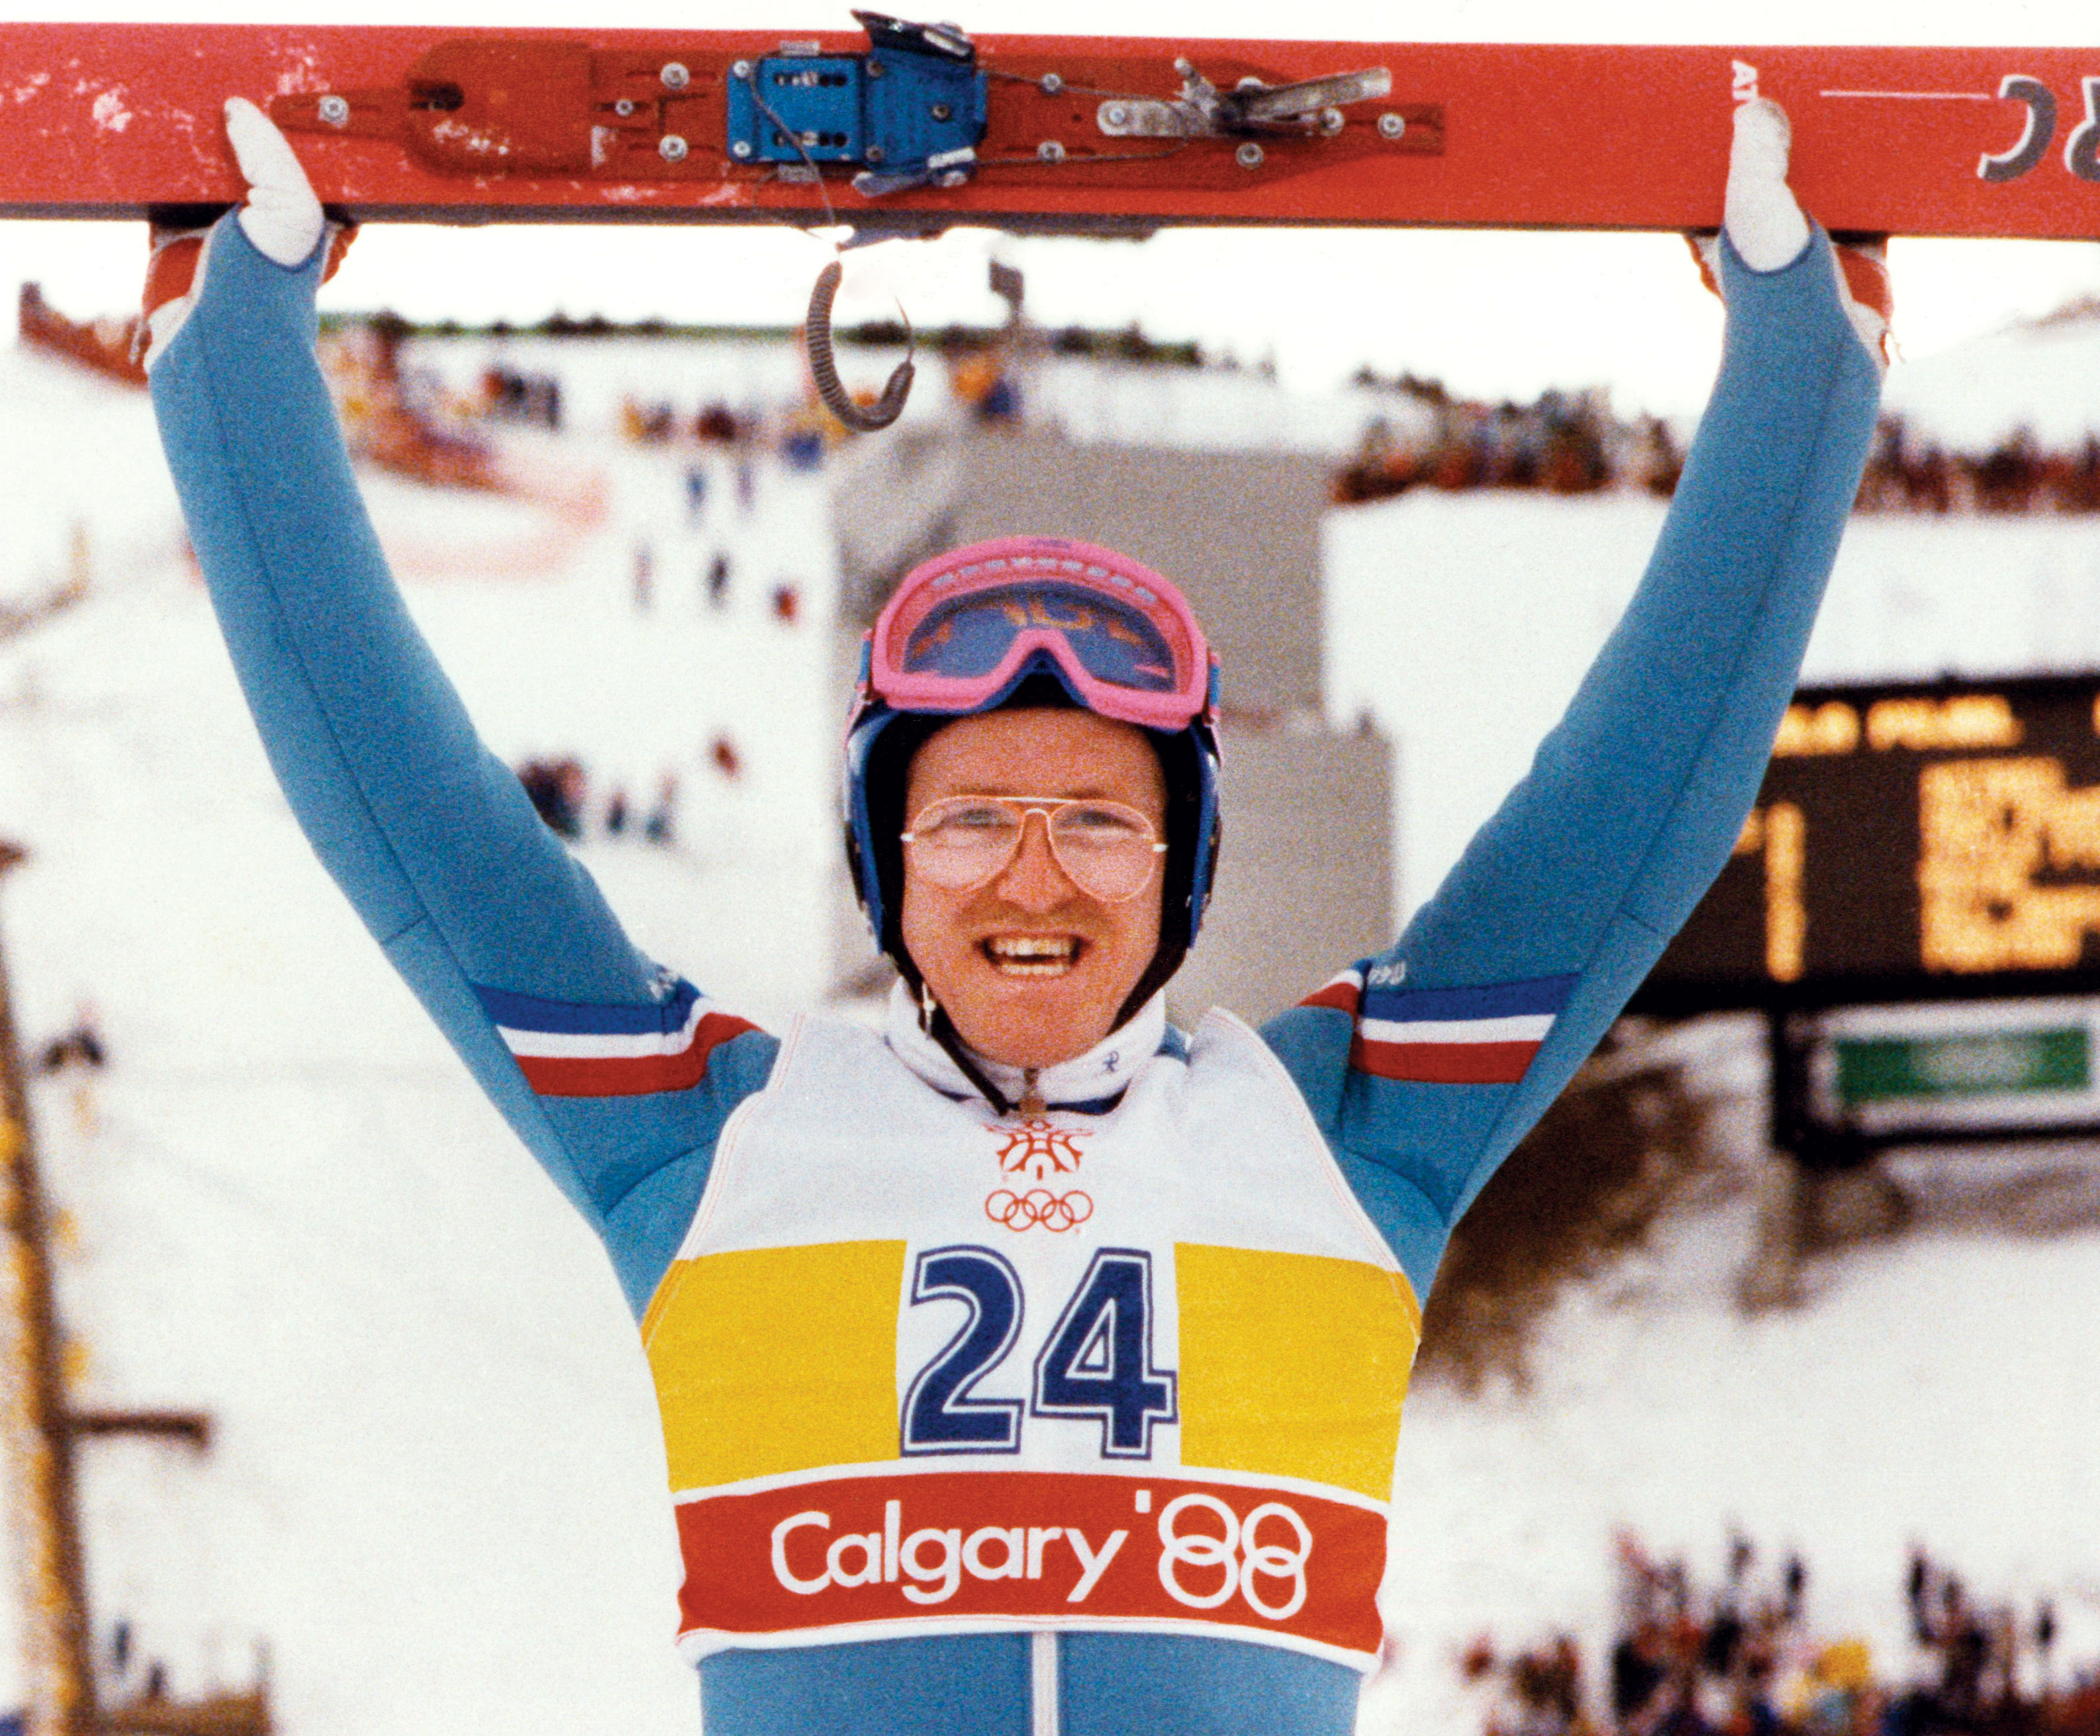 Eddie the Eagle Calgary 1988